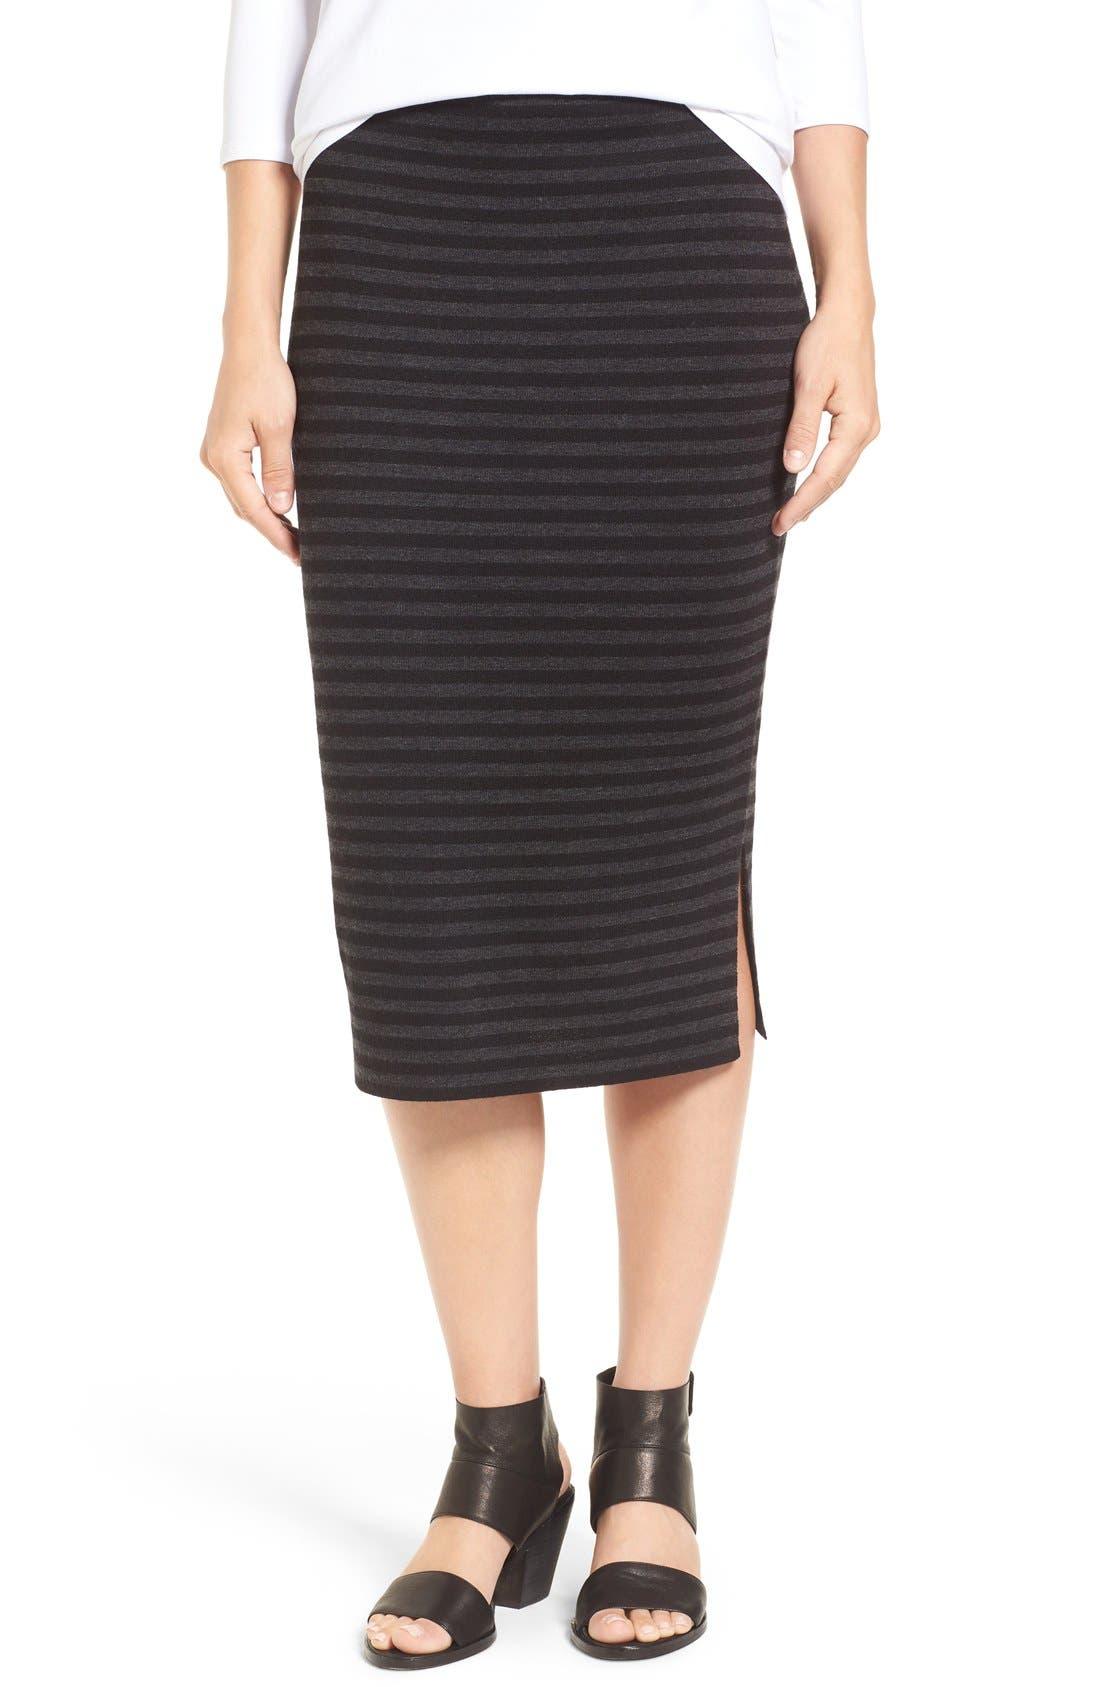 Alternate Image 1 Selected - Eileen Fisher Merino Wool Blend Double Knit Stripe Pencil Skirt (Regular & Petite)